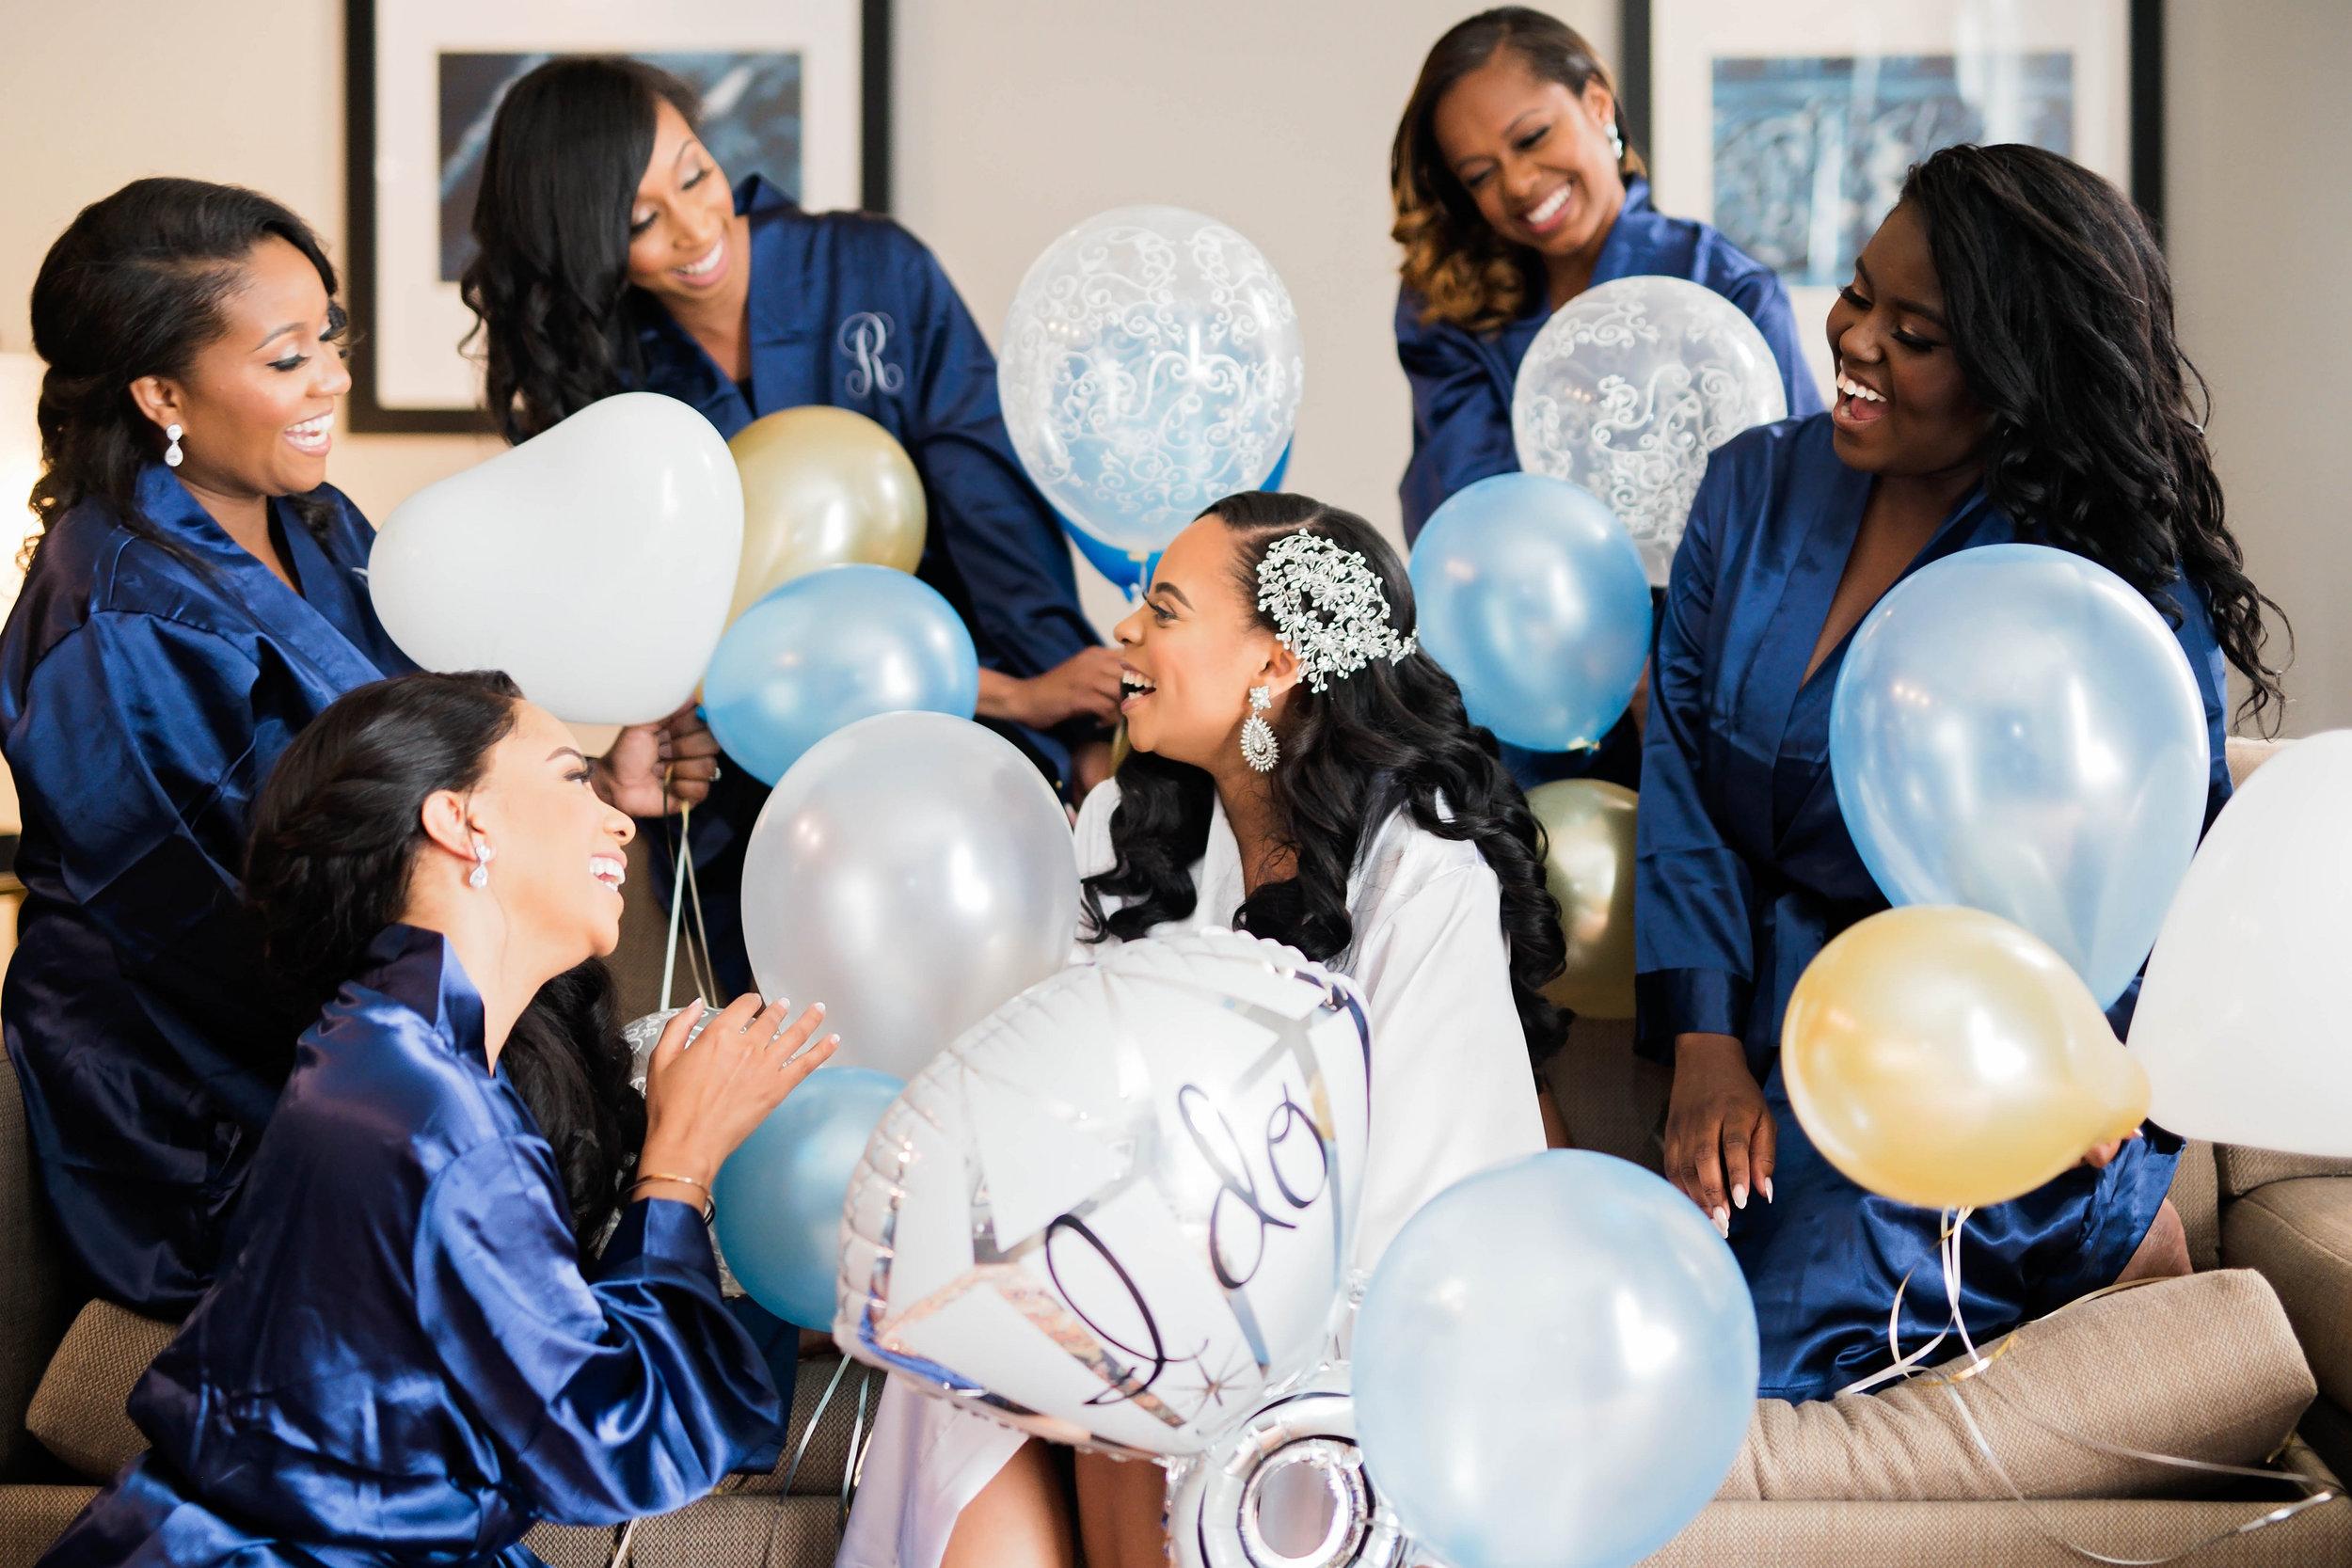 Tulsa Wedding- Pharris Photography- Getting Ready- Darla + Quinton- Bridesmaids